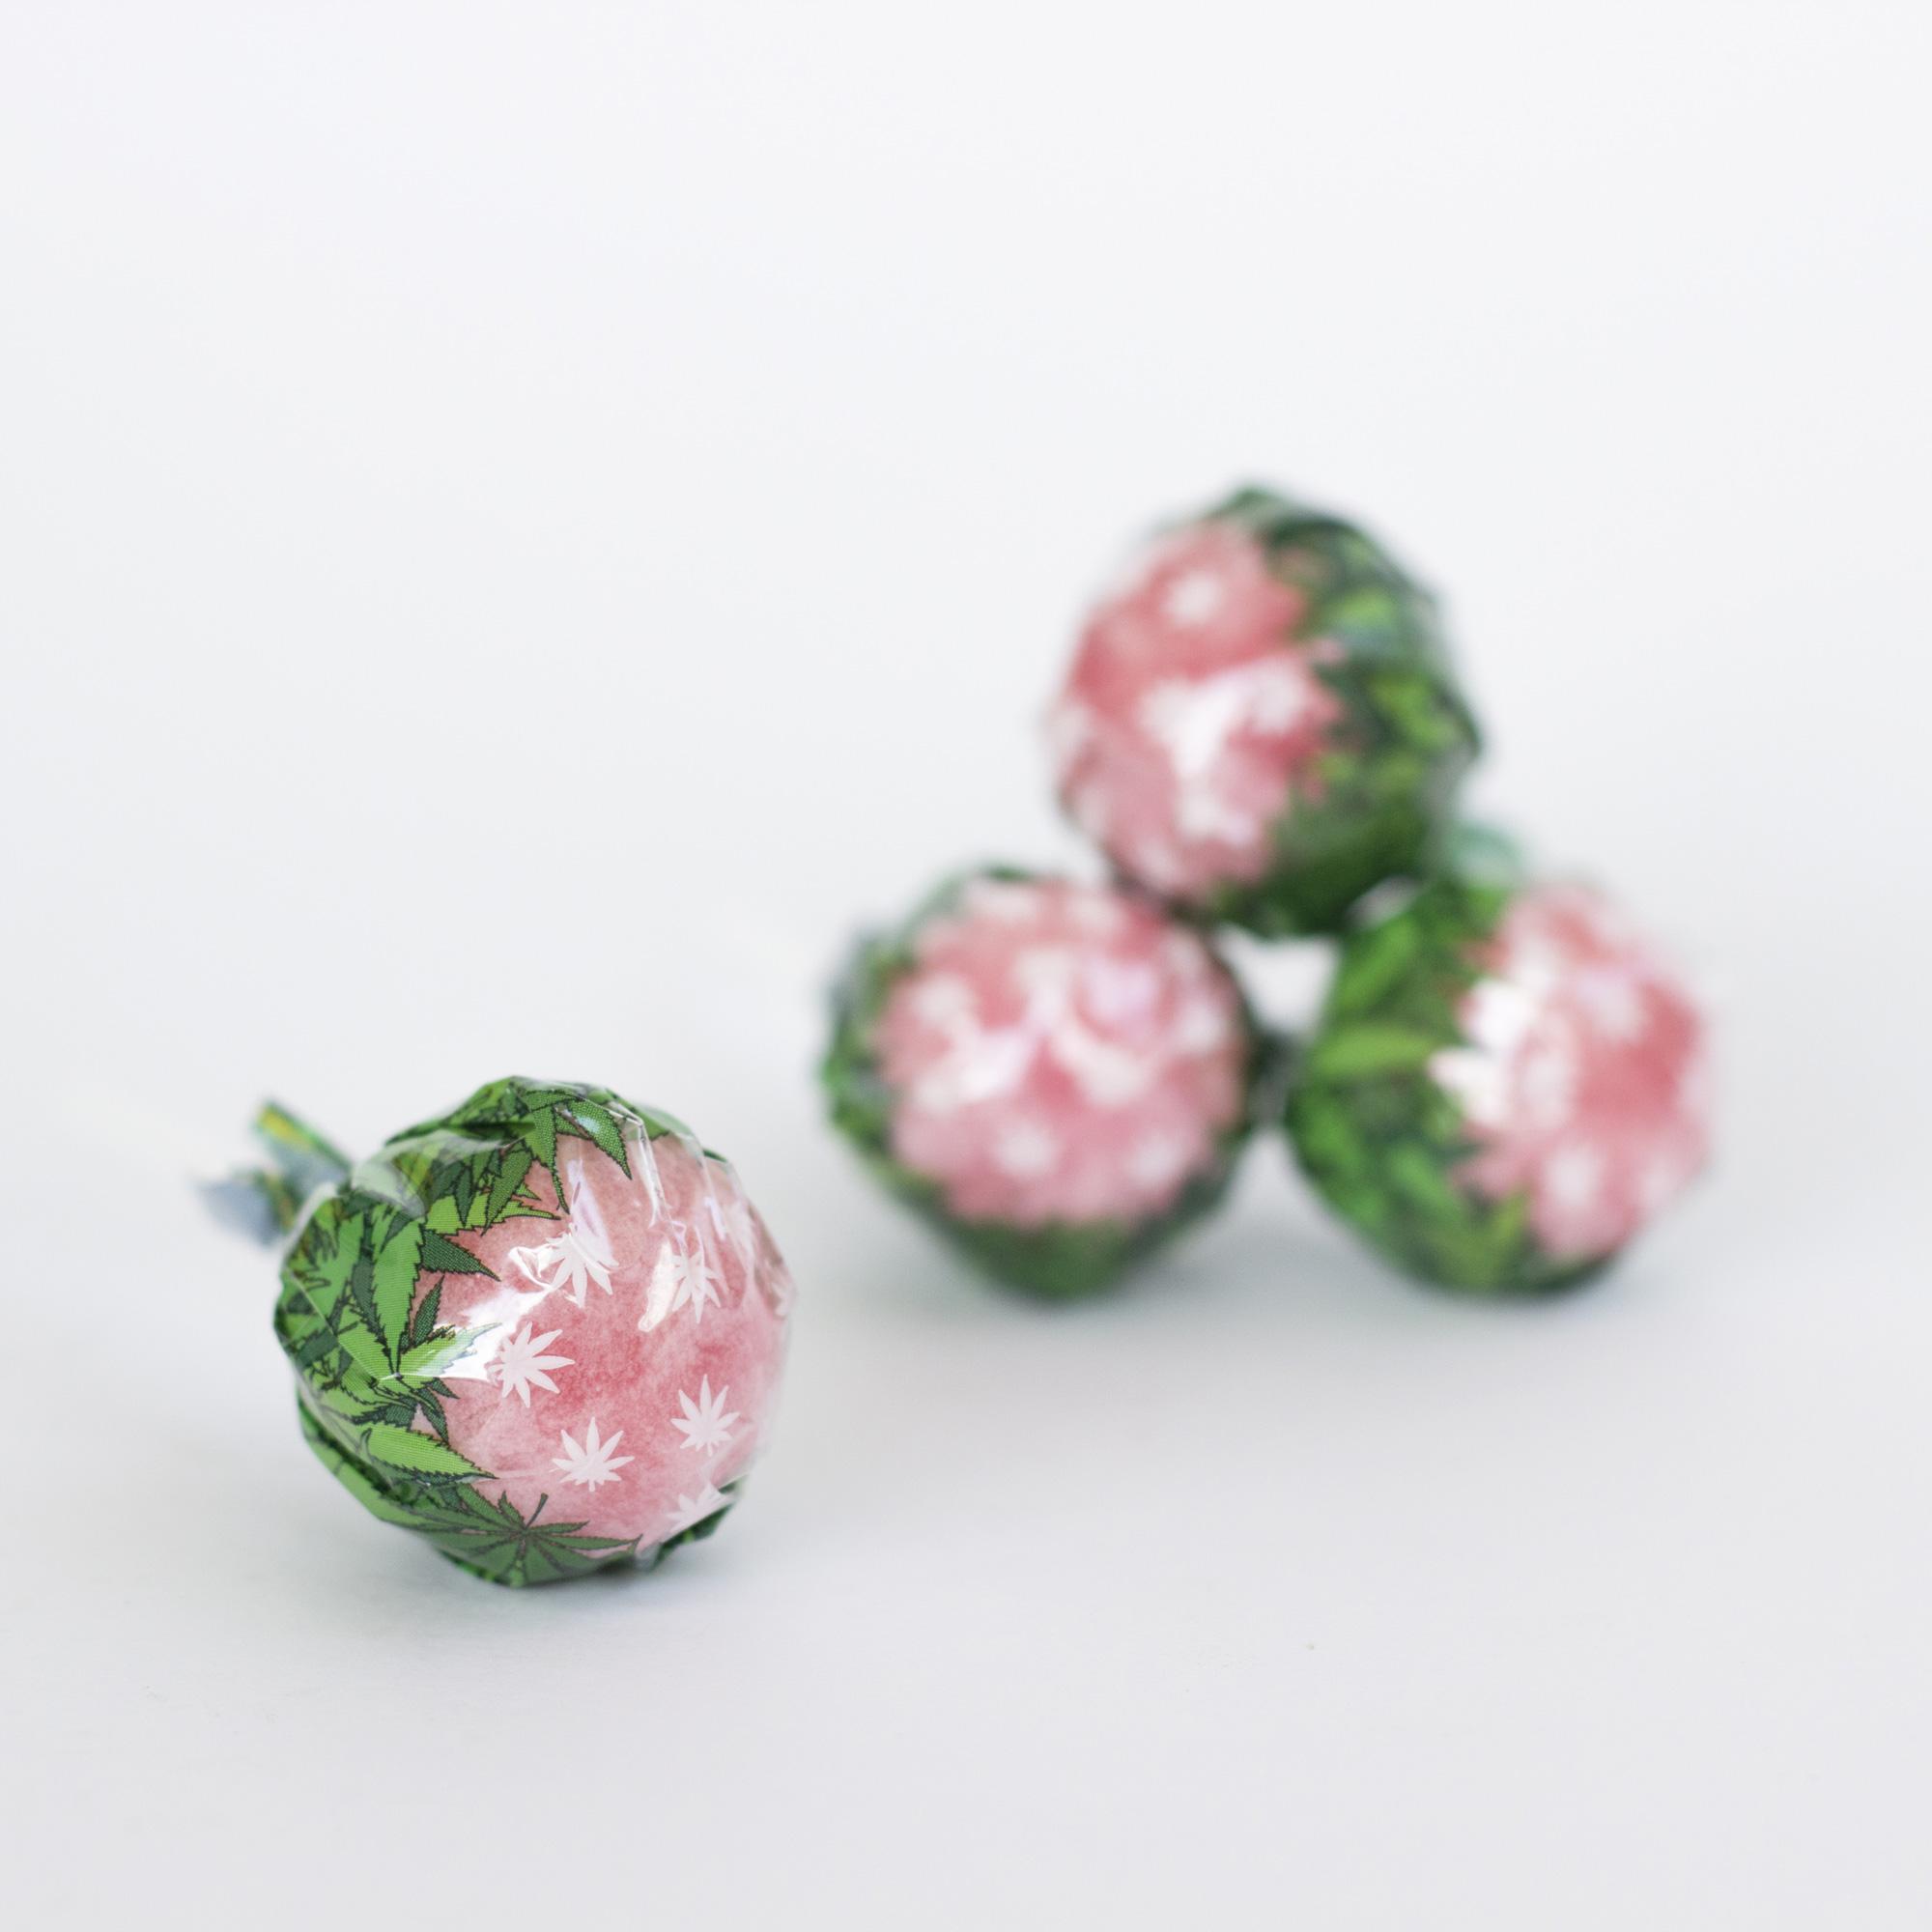 lollipop straw - Lollipop - Strawberry